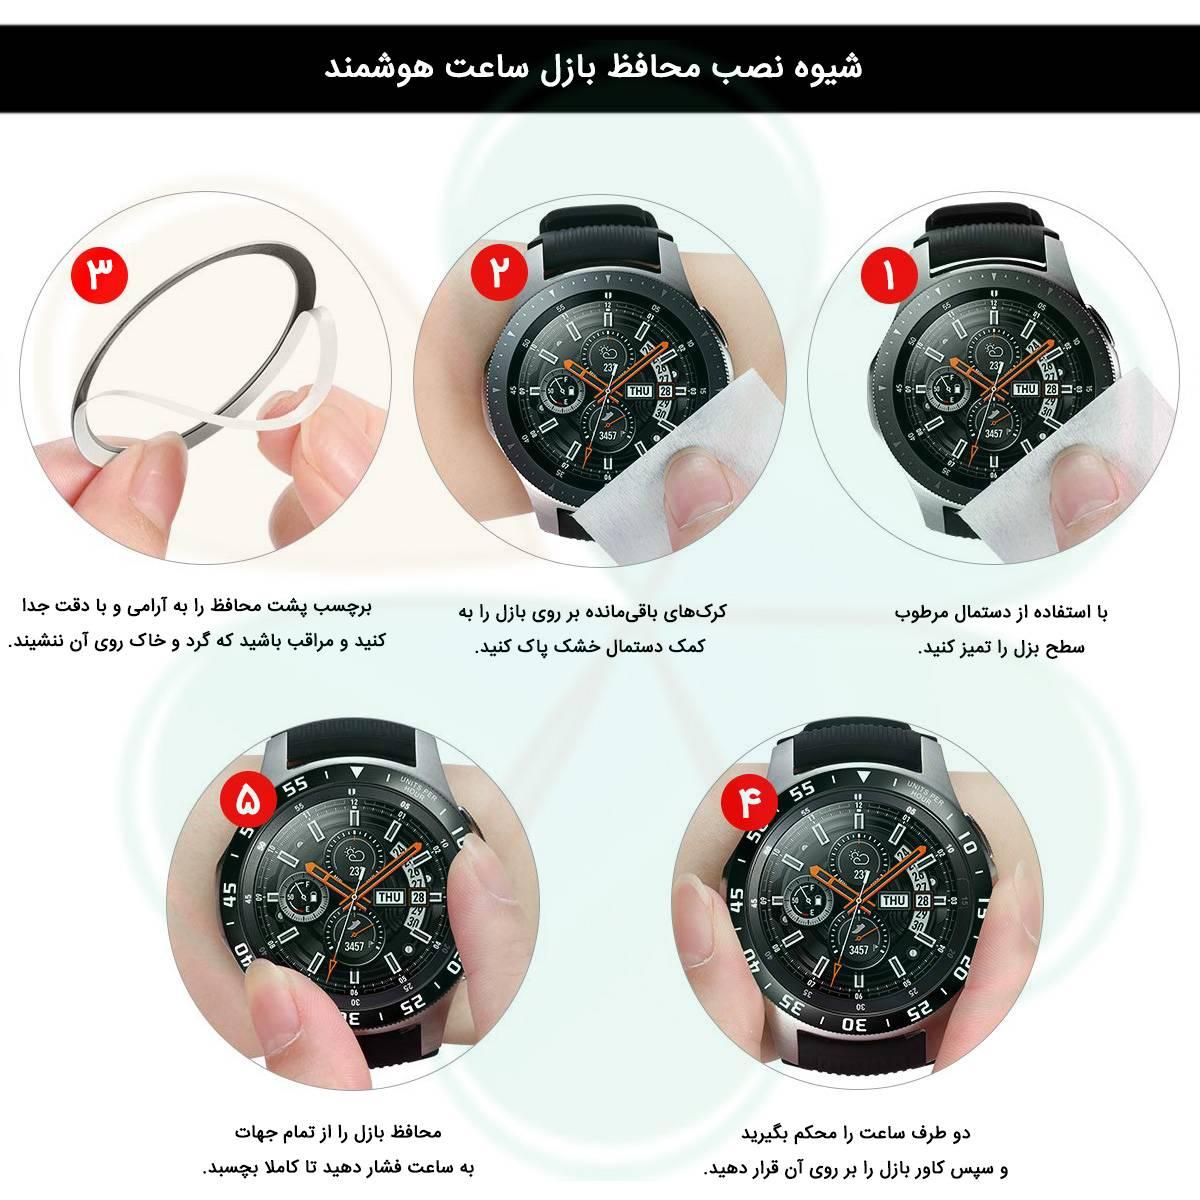 خرید محافظ بازل ساعت هوشمند سامسونگ Samsung Gear S3 frontier